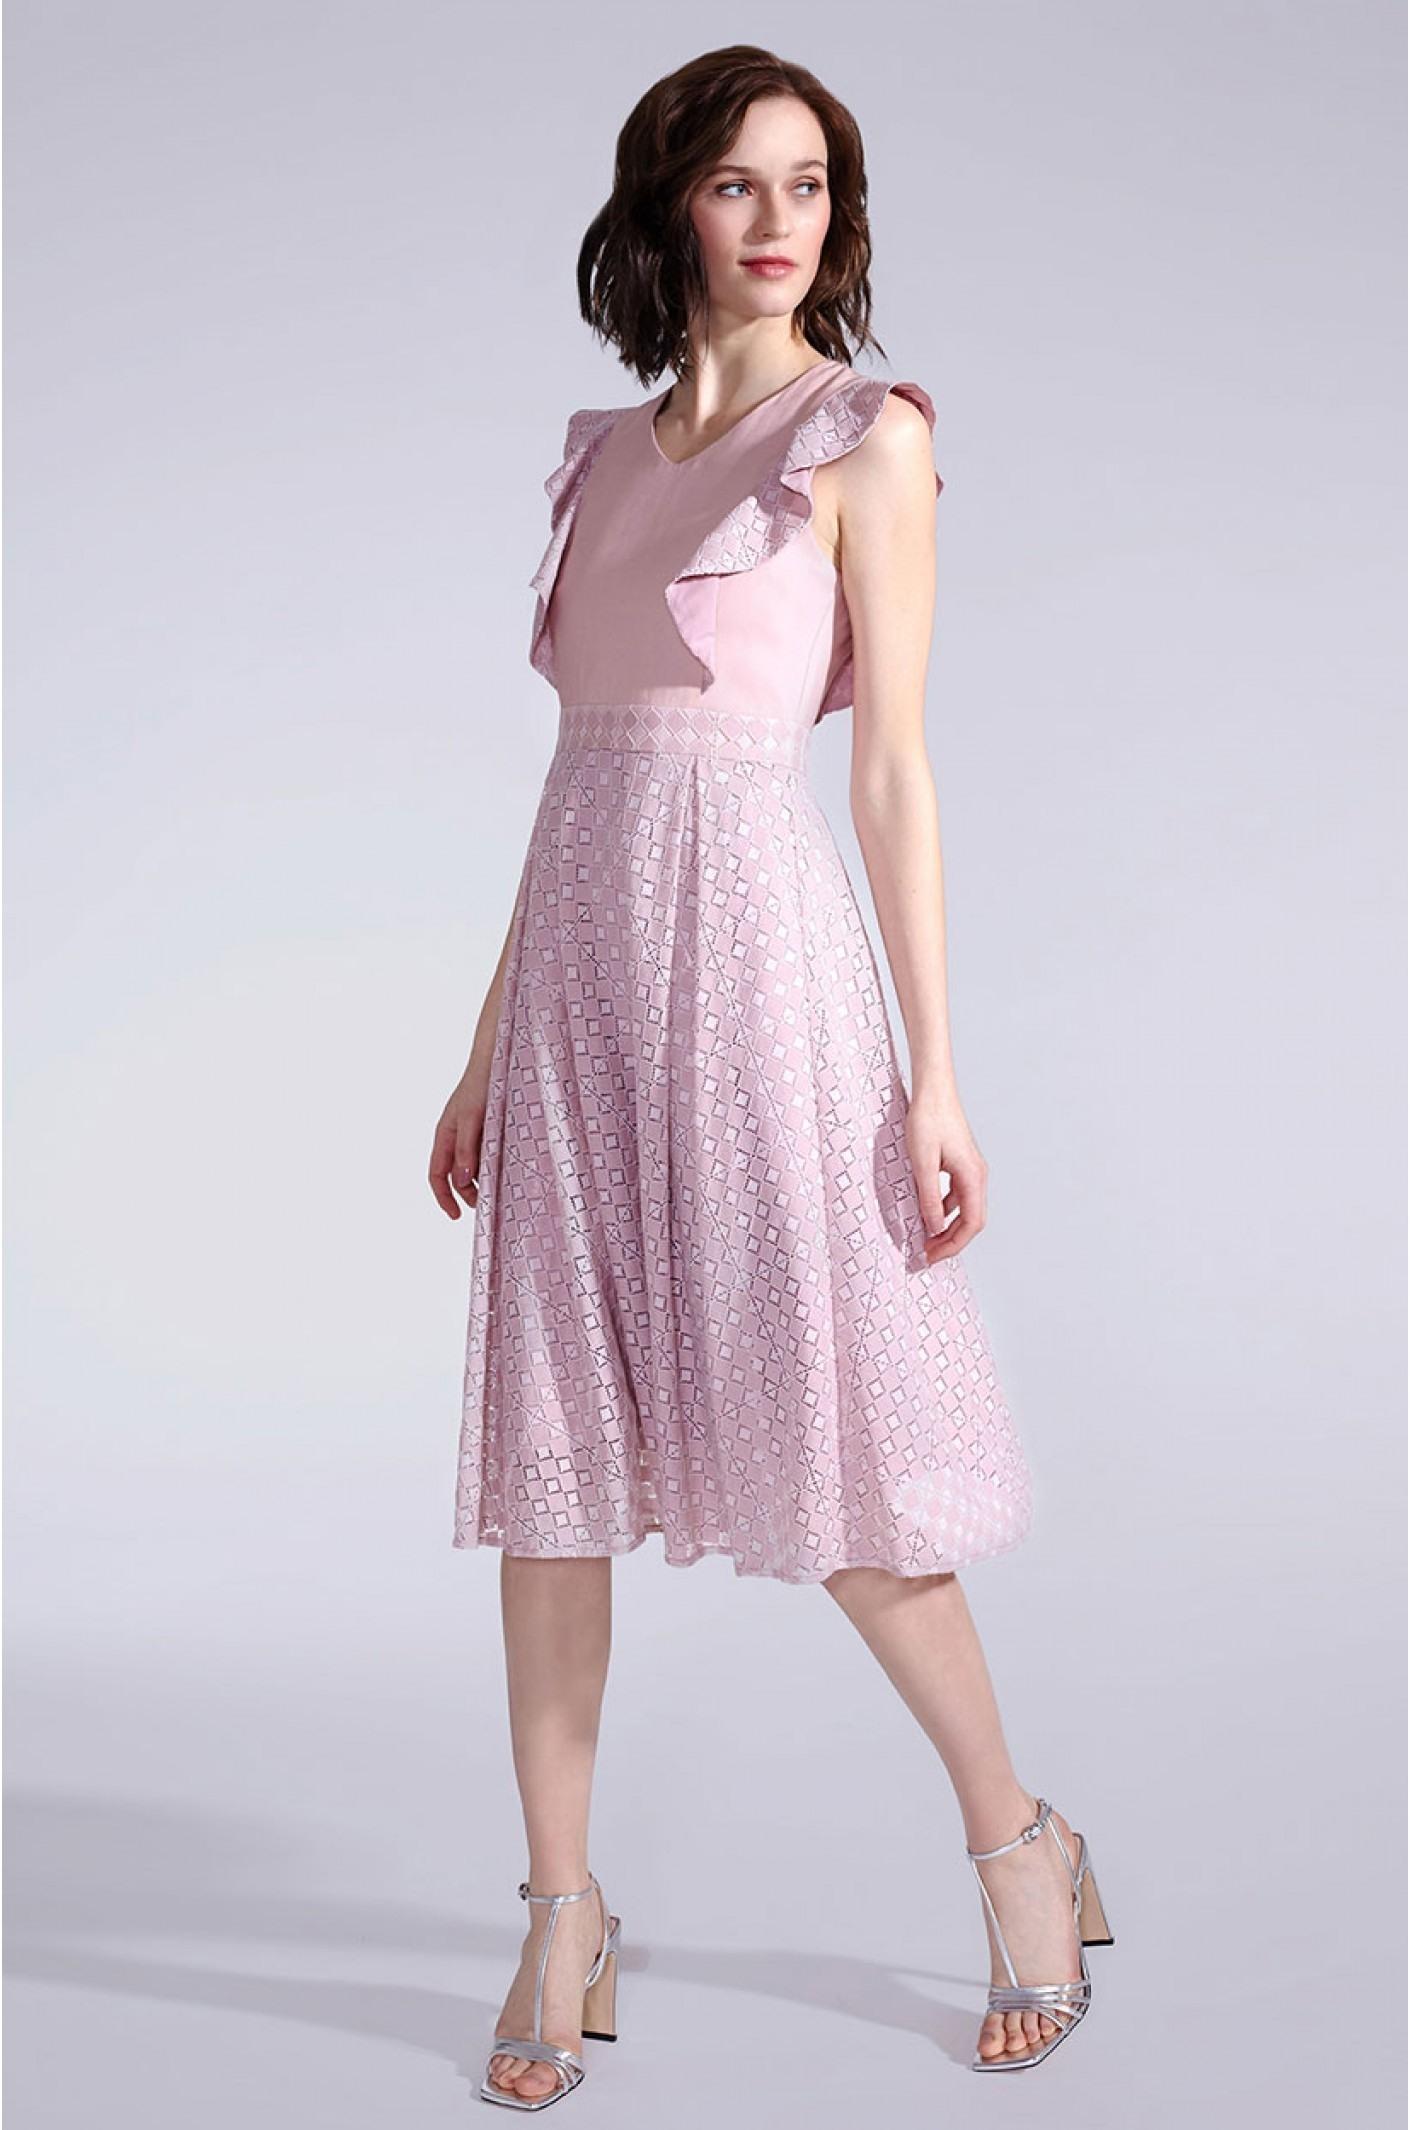 Elegant Winterkleid Elegant Vertrieb15 Schön Winterkleid Elegant Bester Preis